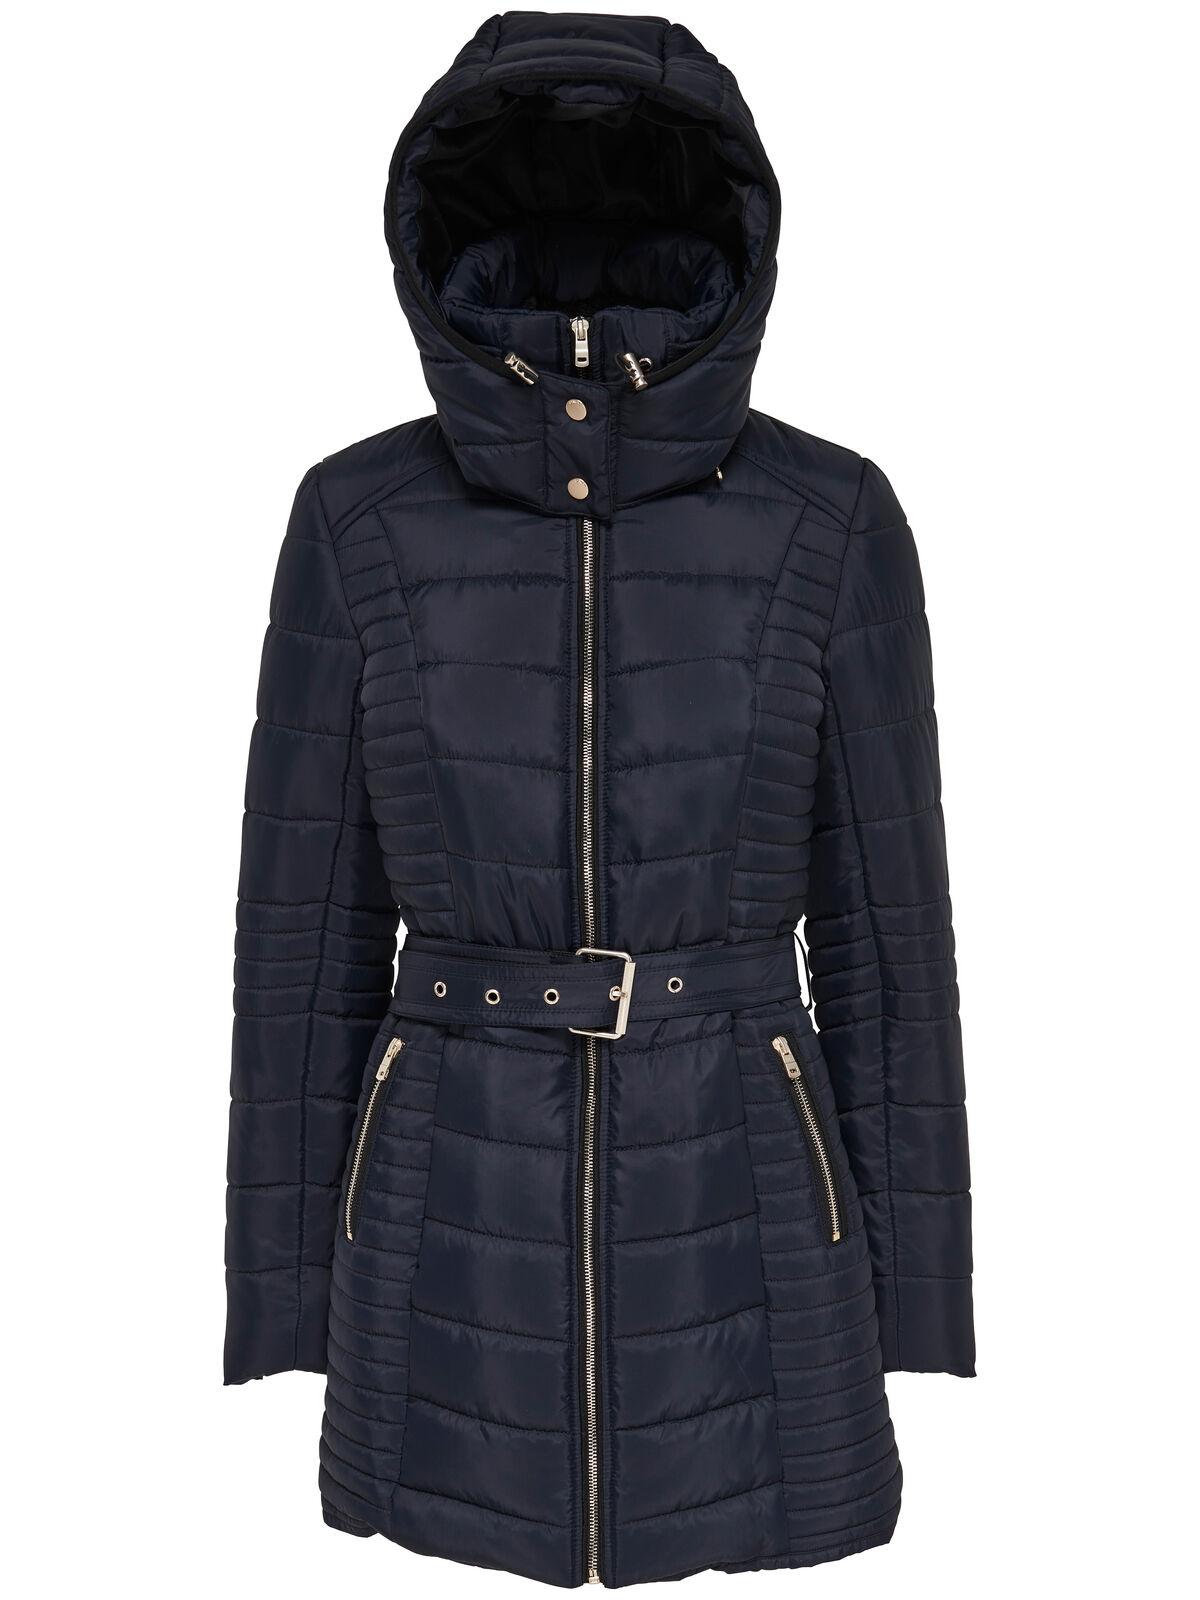 ONLY Damen Winterjacke Stepp-Jacke Mantel onlADRIATIC LONG NYLON COAT Gürtel NEU